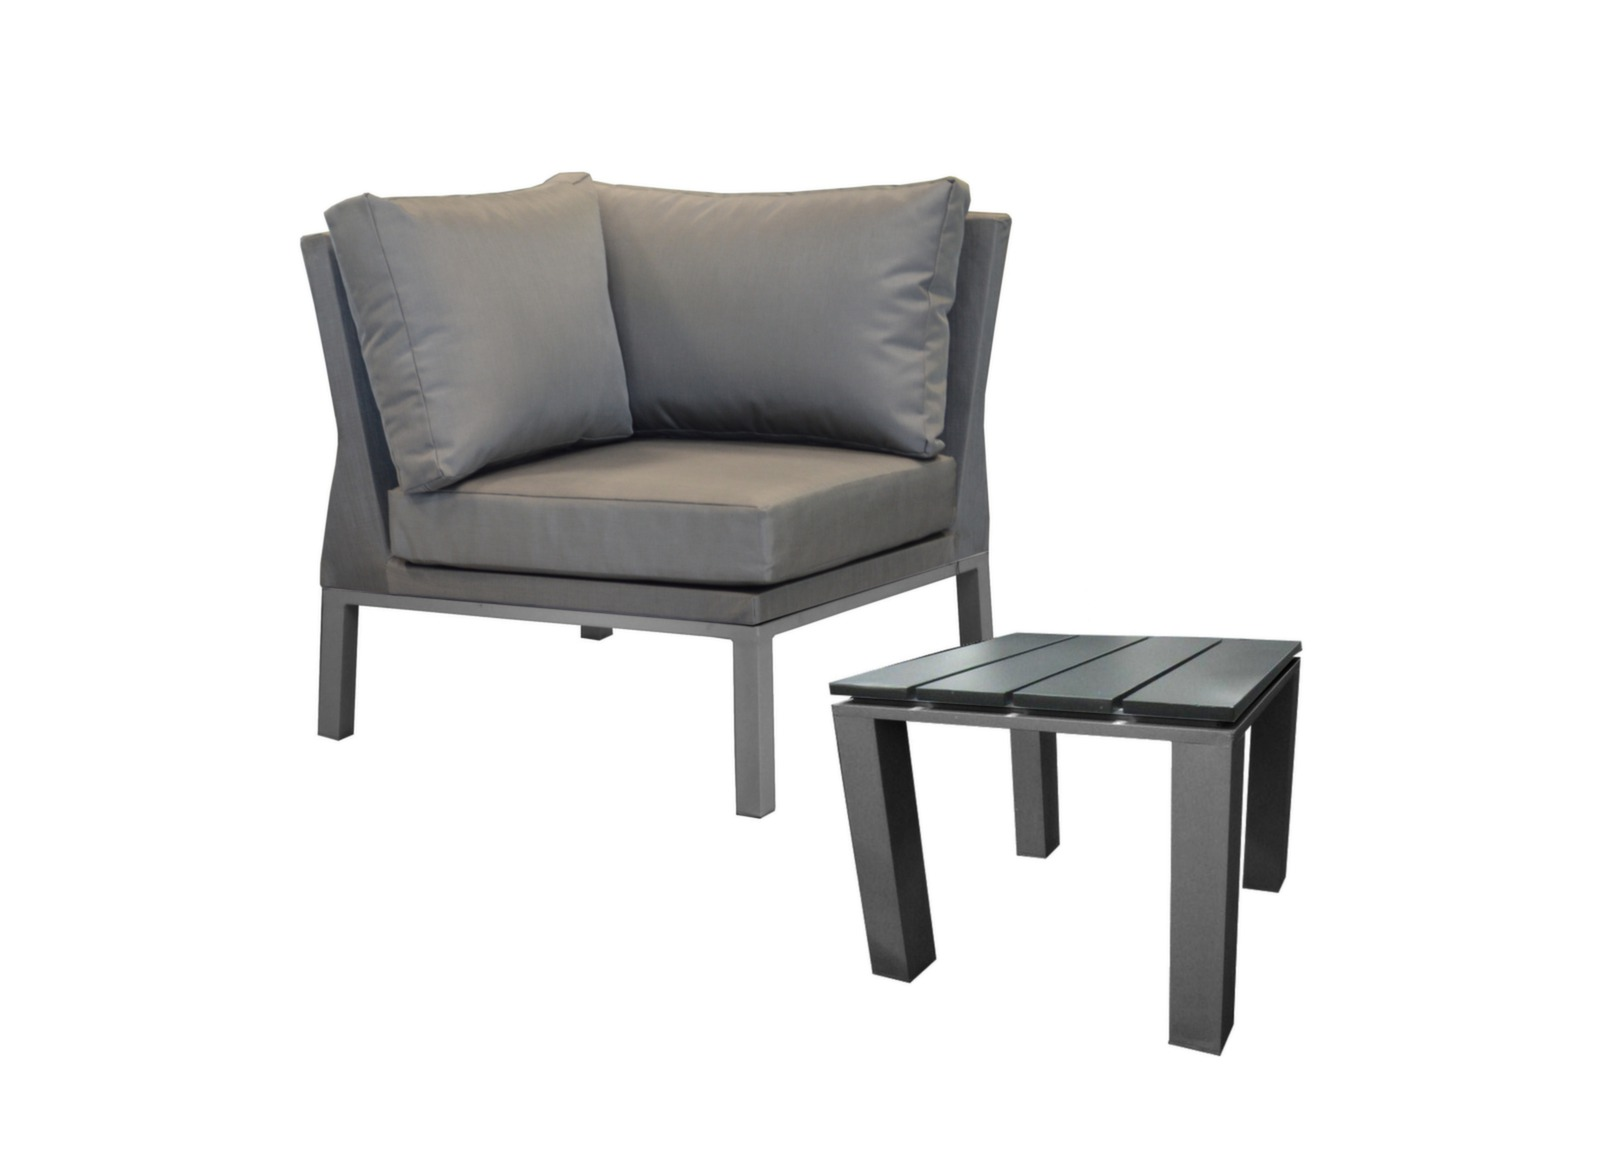 fauteuil d 39 angle table basse oslo mobilier de jardin proloisirs. Black Bedroom Furniture Sets. Home Design Ideas